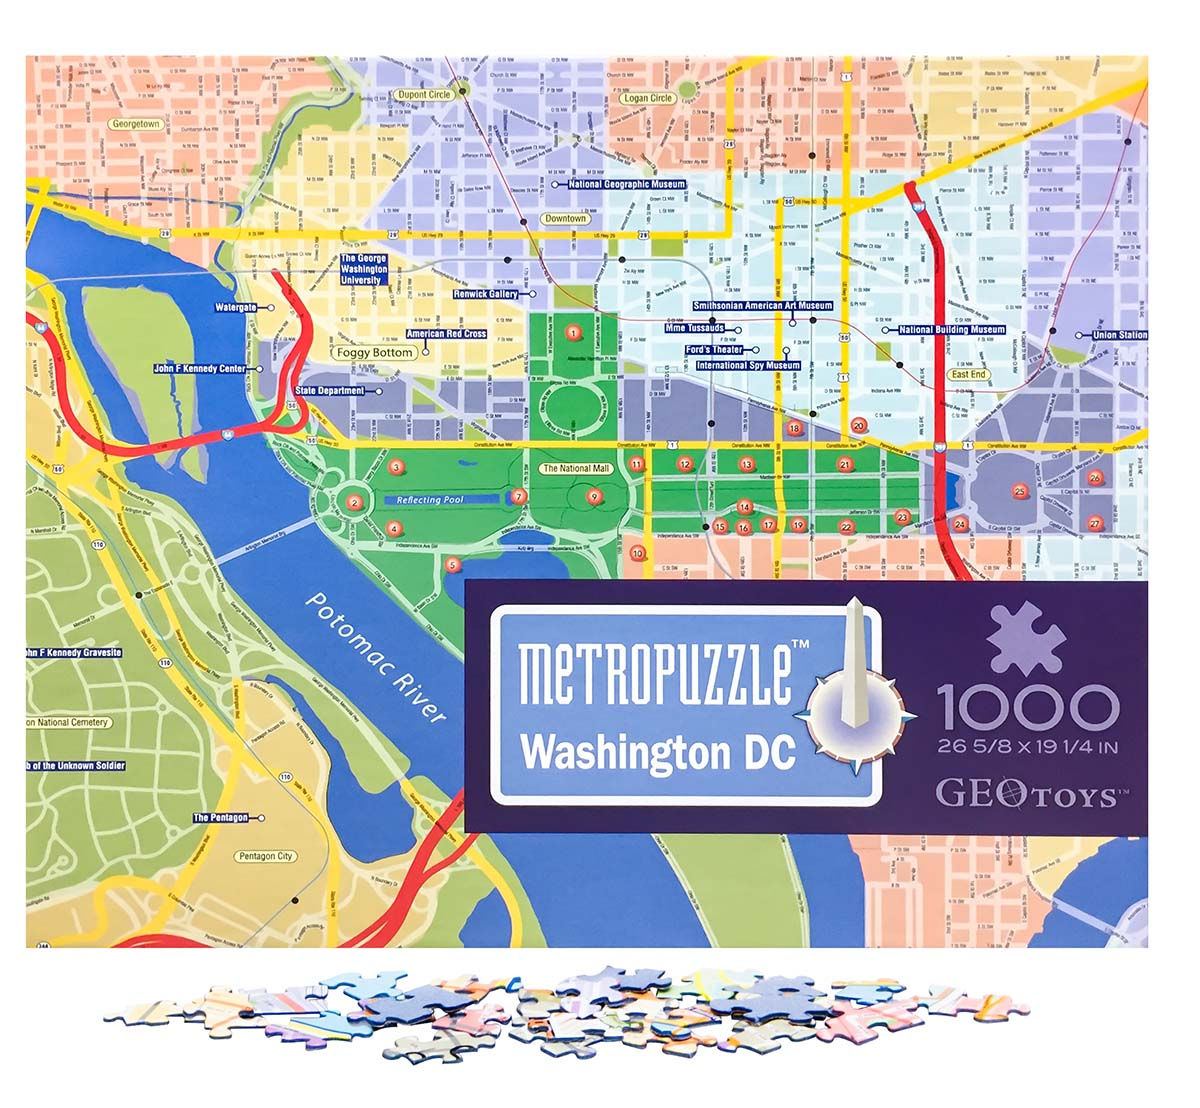 Washington, D C  MetroPuzzle